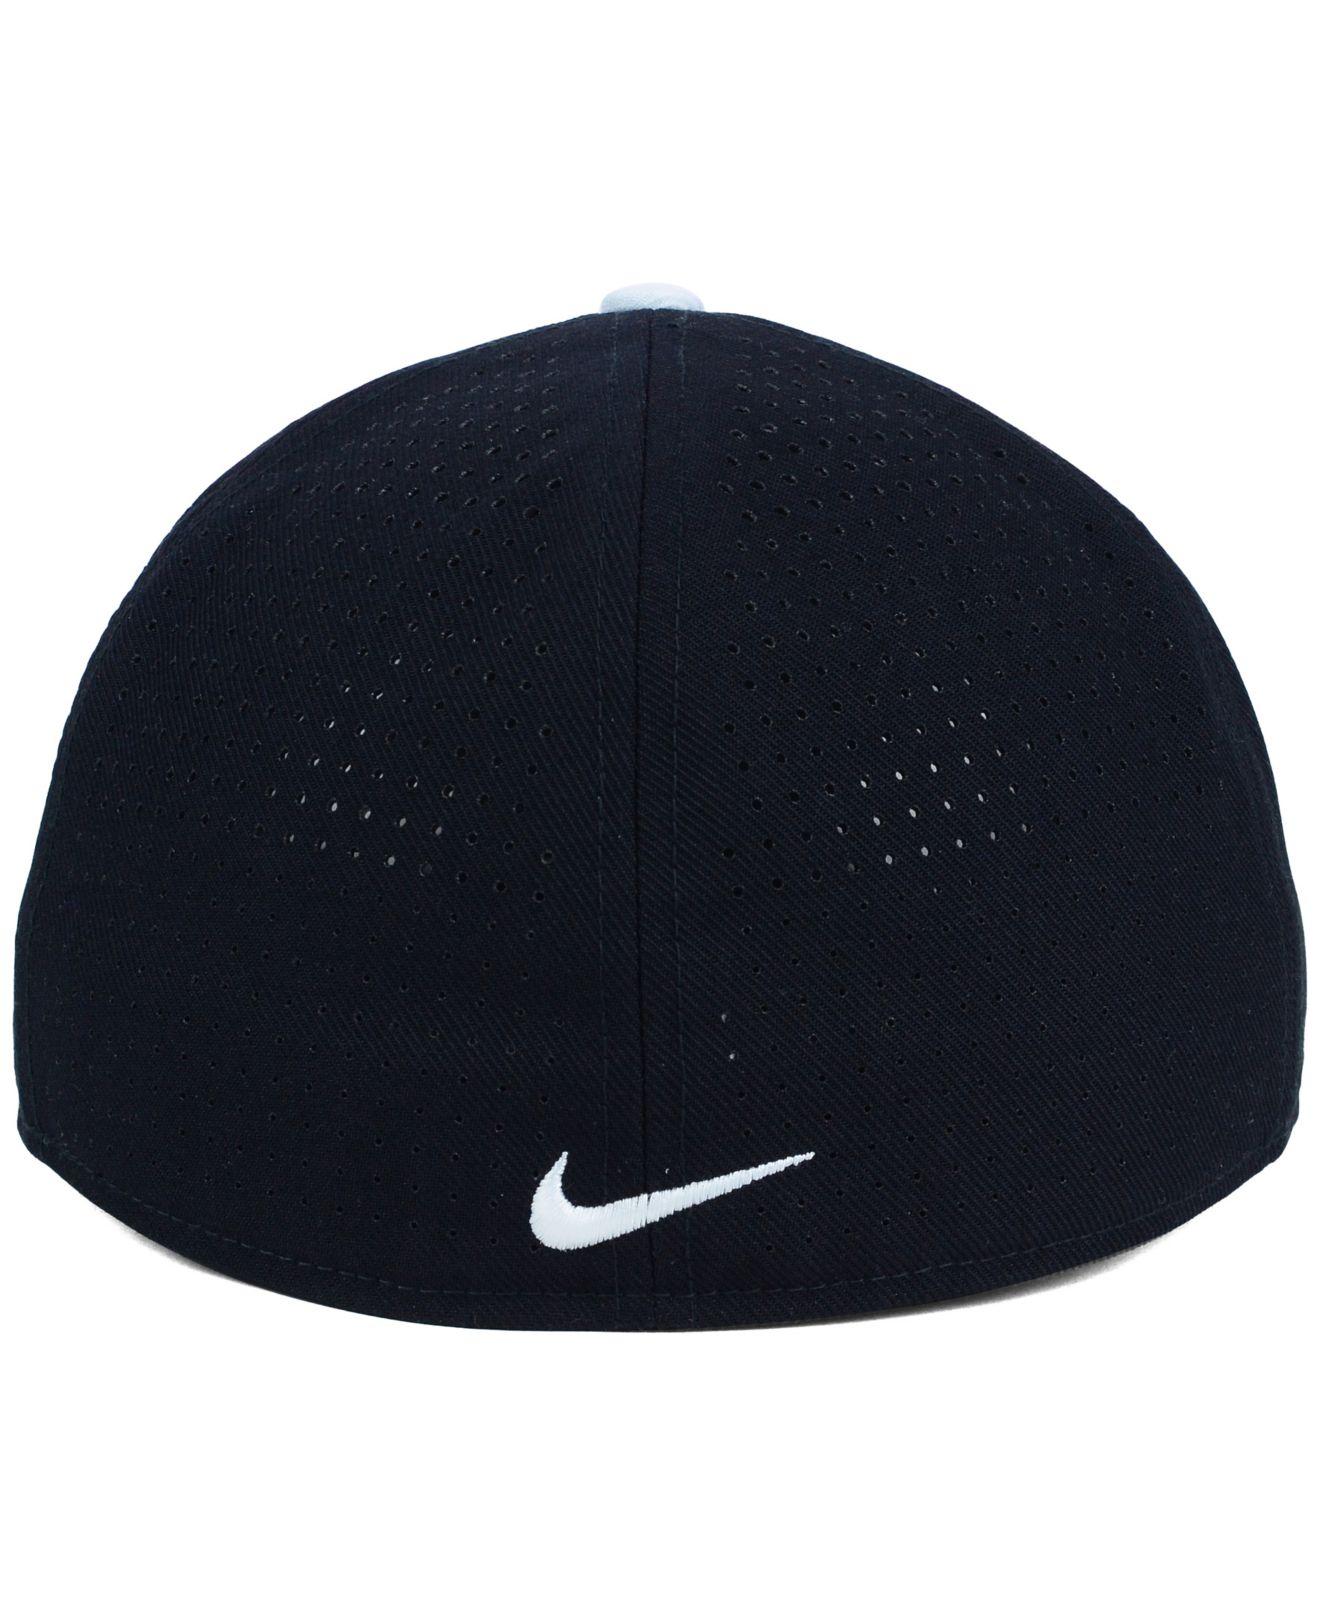 Lyst - Nike Dallas Cowboys True Vapor Fitted Cap in Black for Men 97ef305b8174